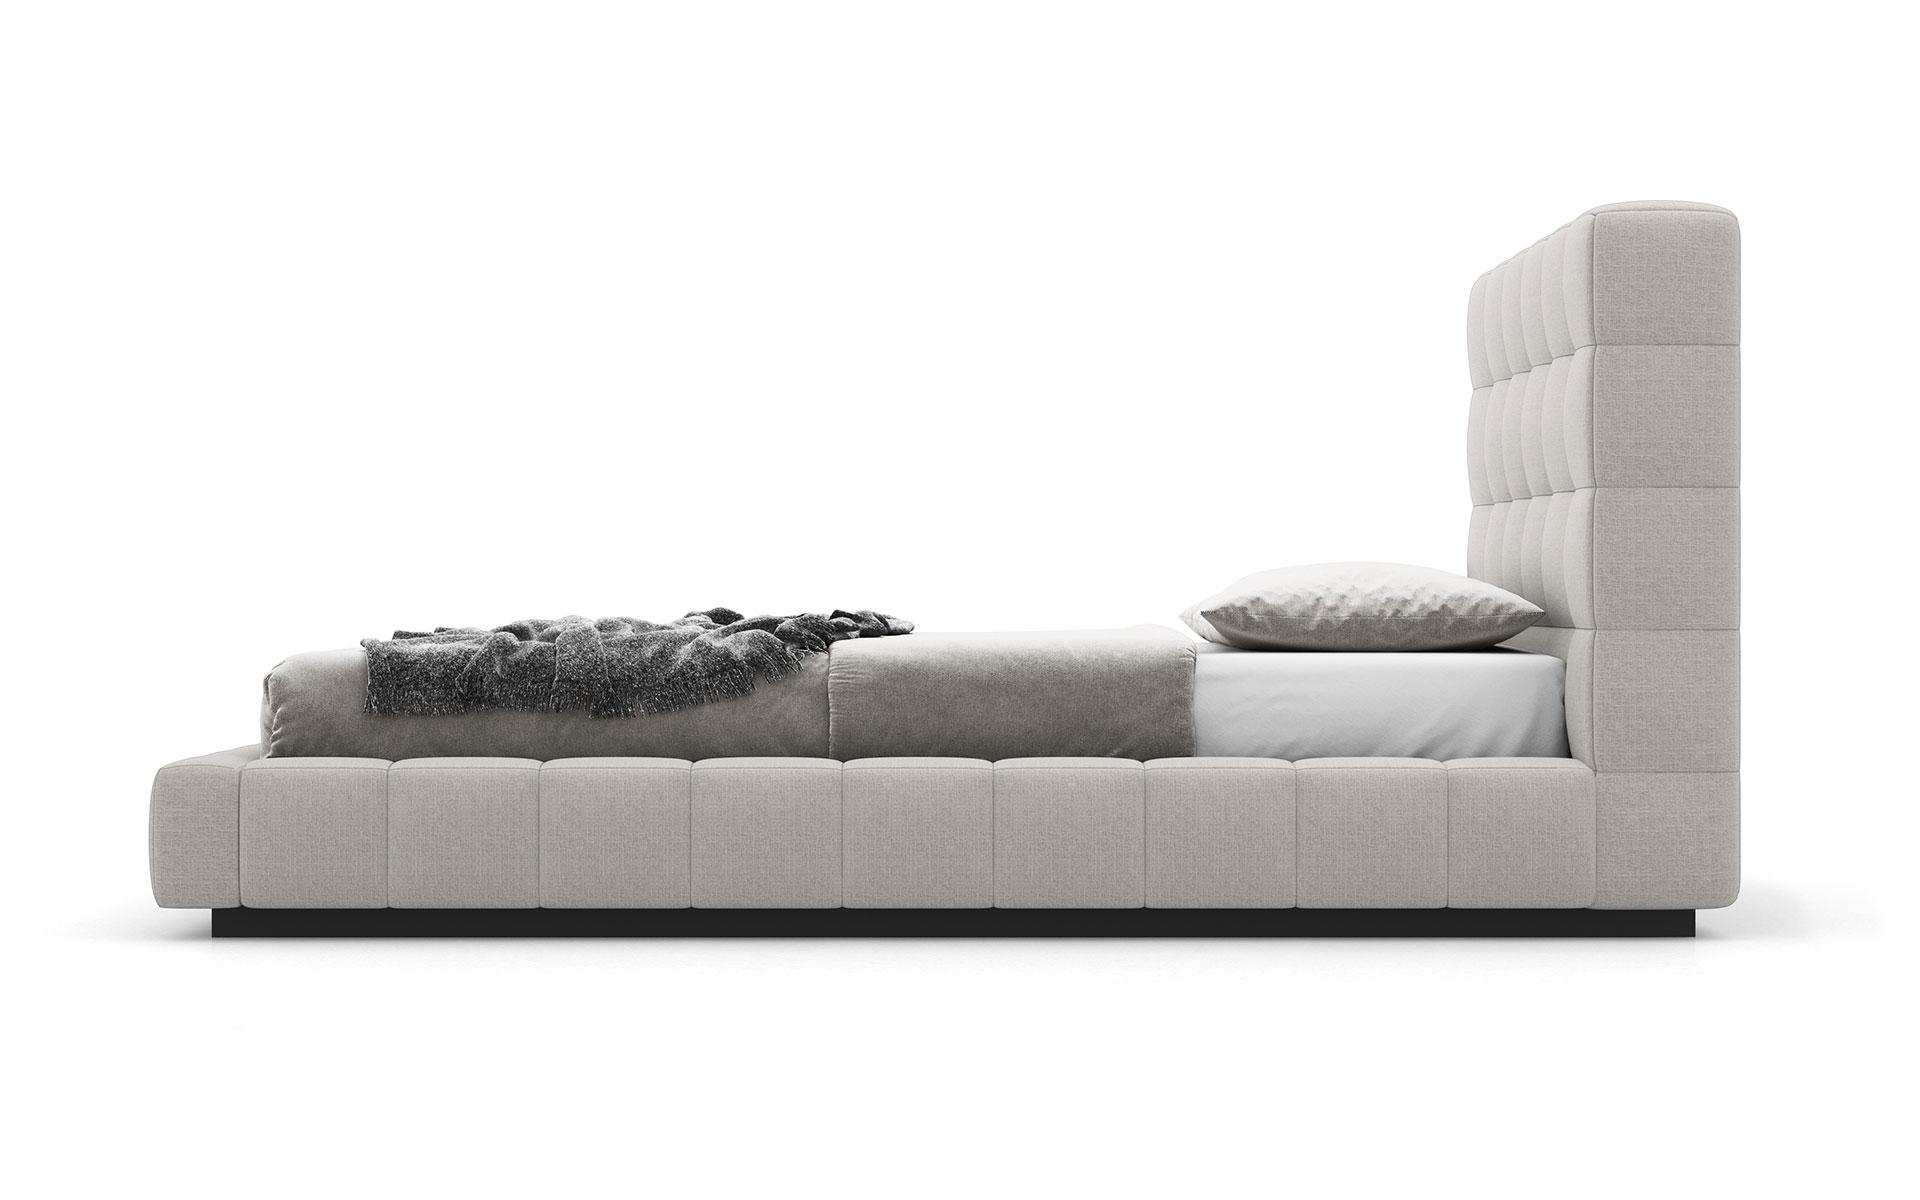 Thompson Bed